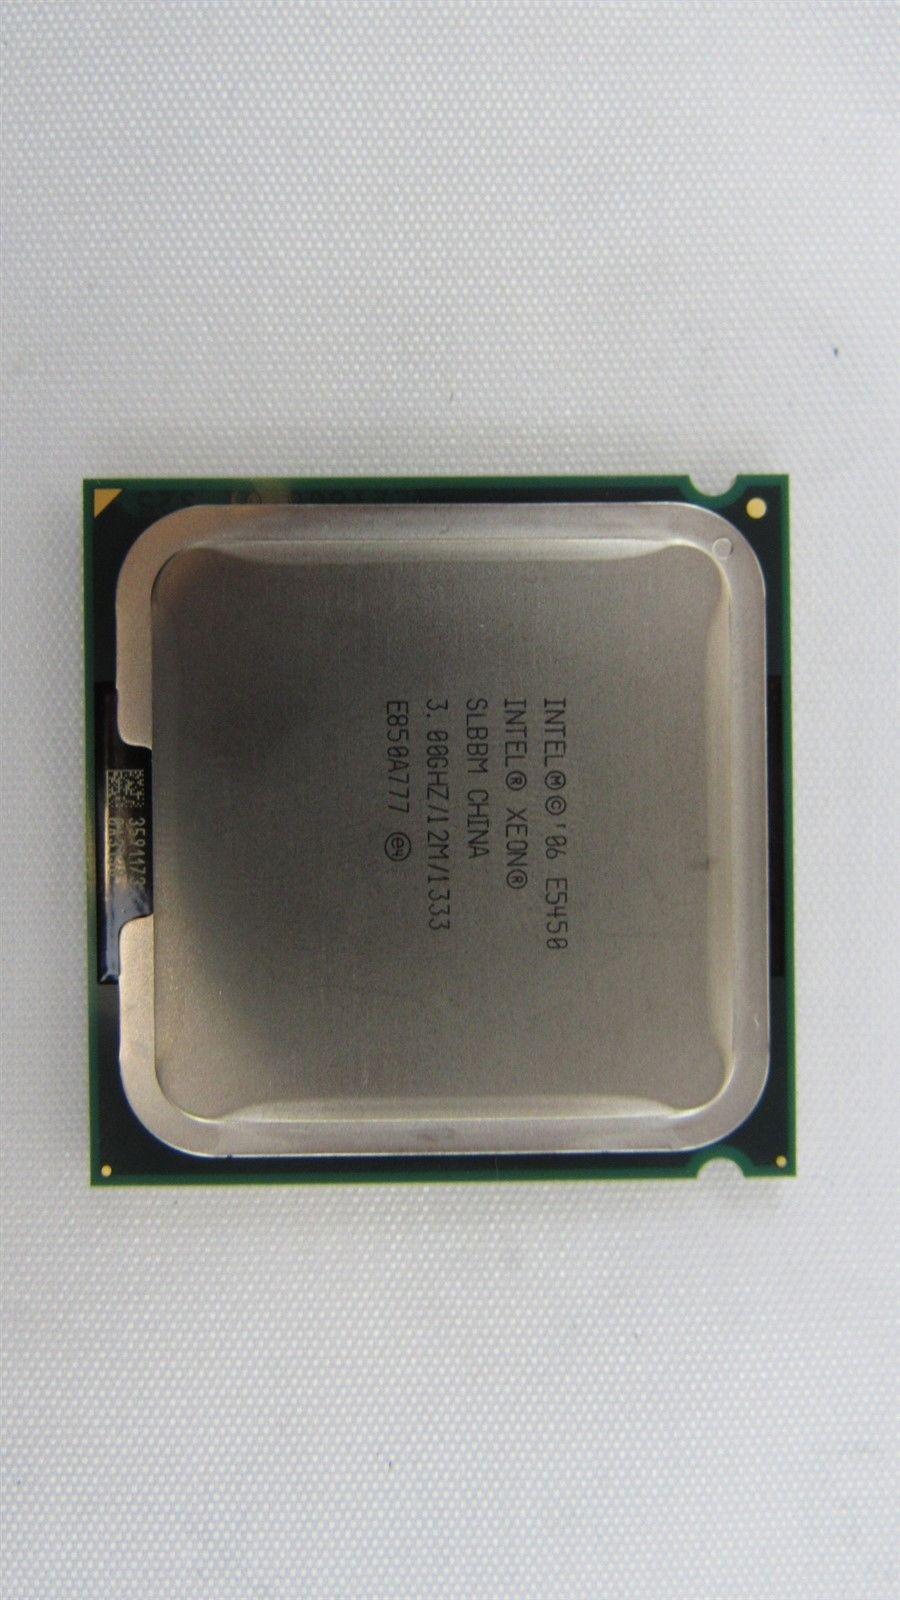 Intel Xeon E5450 Quad Core 3 00GHz 1333MHz 12MB Socket LGA771 Processor  SLBBM